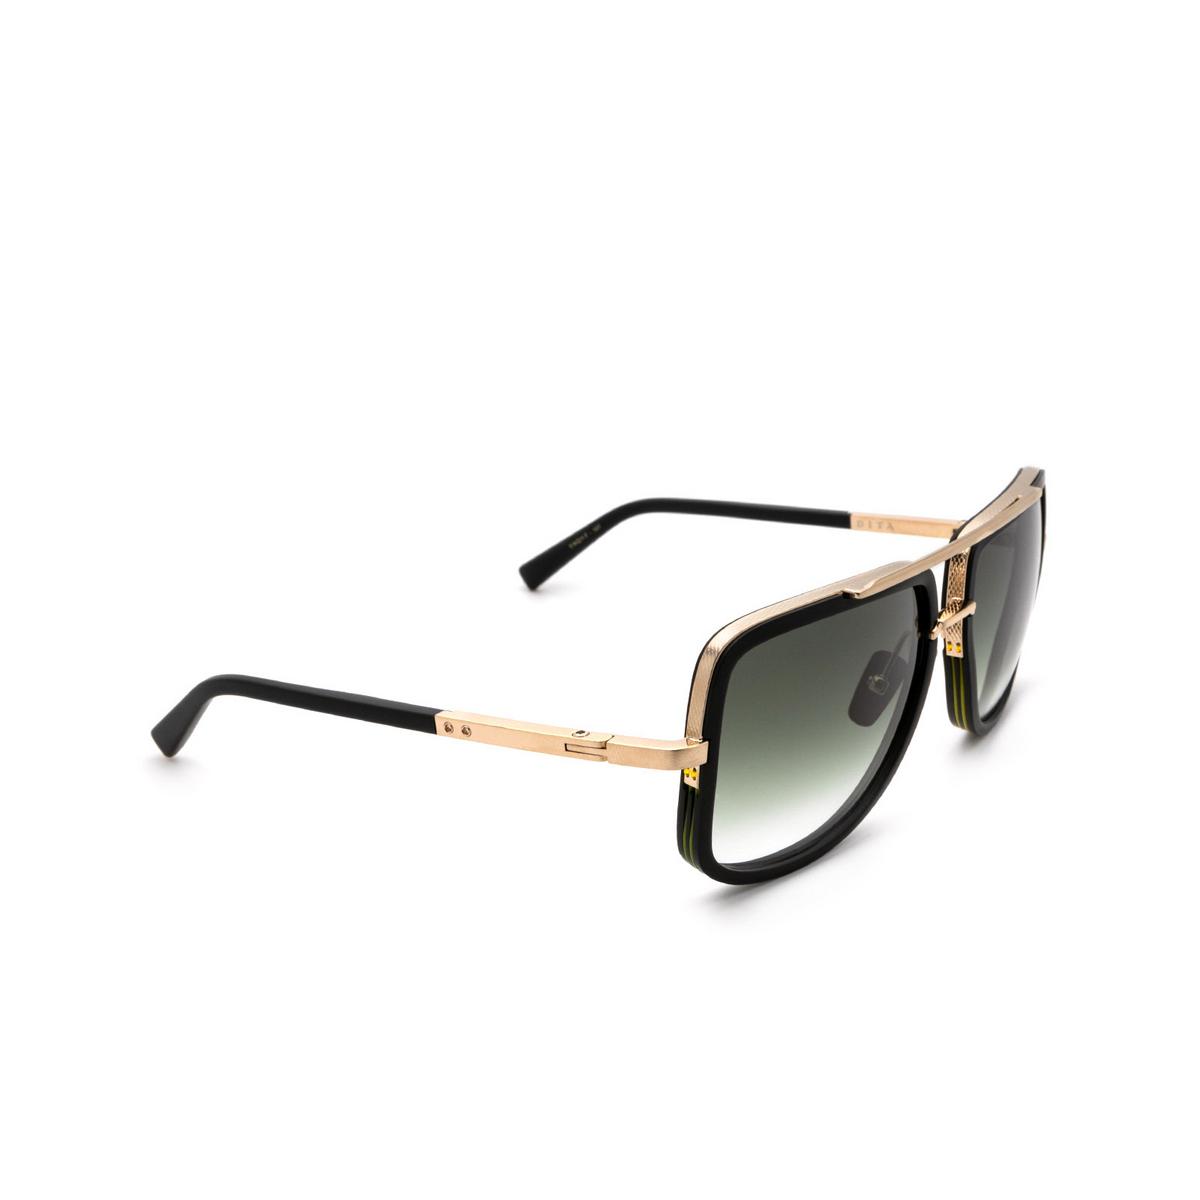 Dita® Aviator Sunglasses: Mach-one DRX-2030-F-BLK-12K-59-Z color Black BLK-12K.